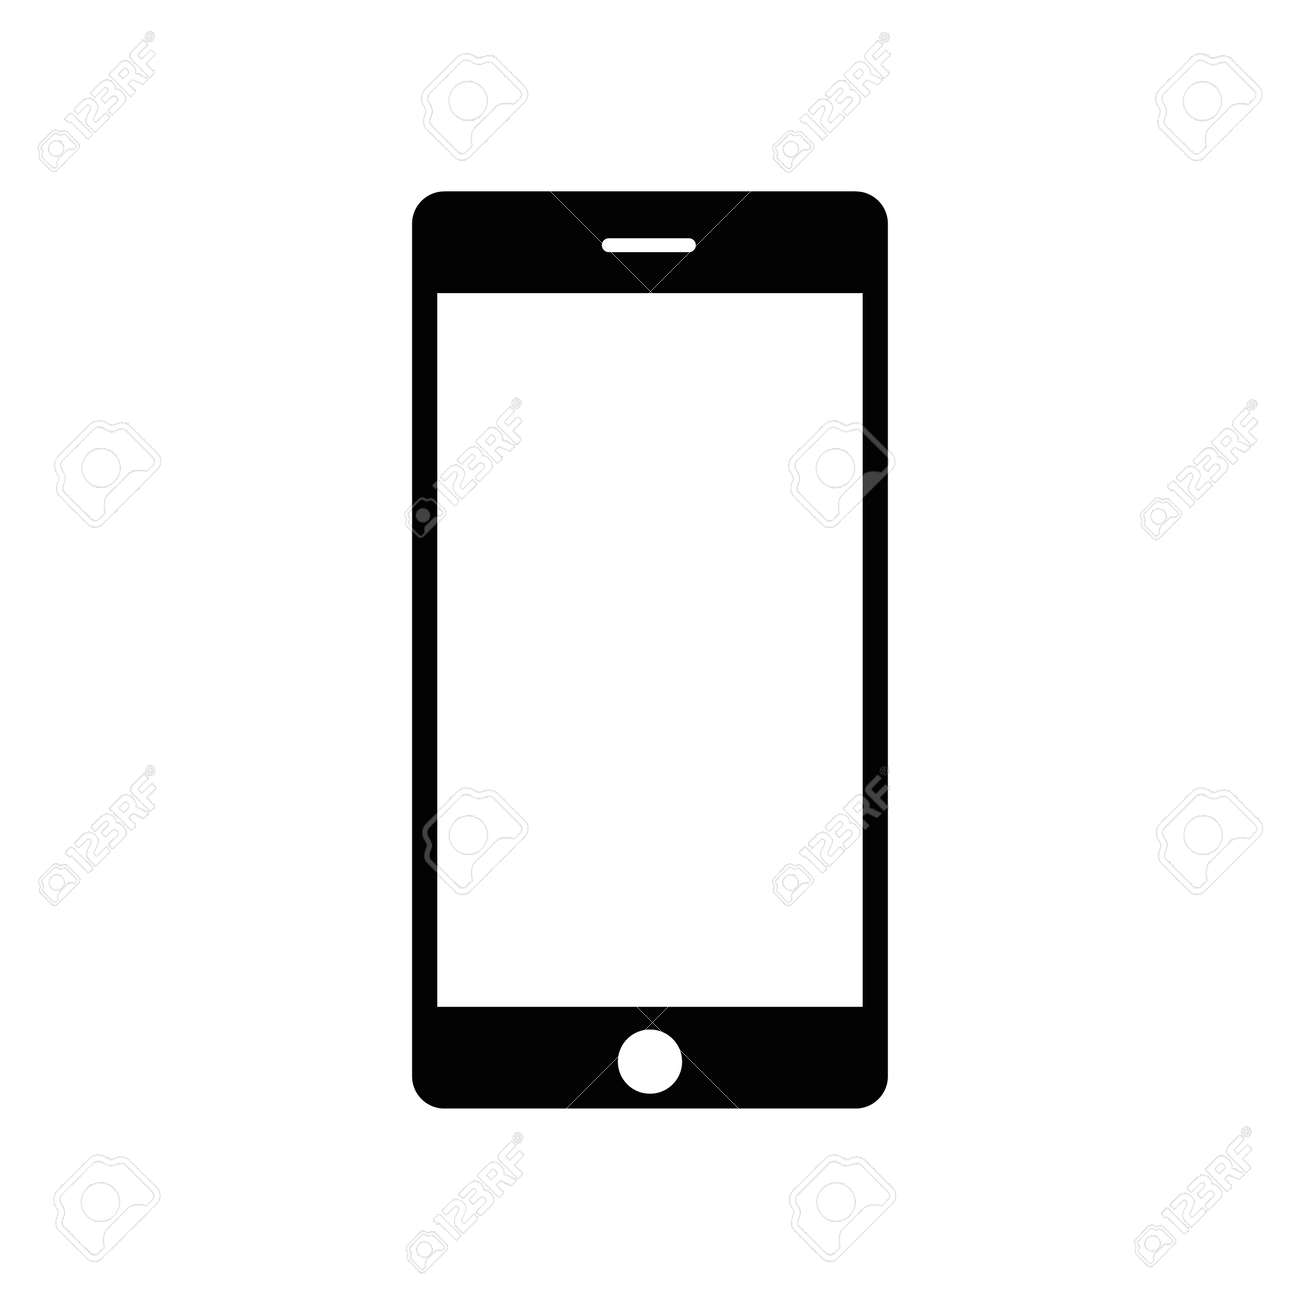 Smartphone icon. flat icon mobile handphone symbol - 165490624